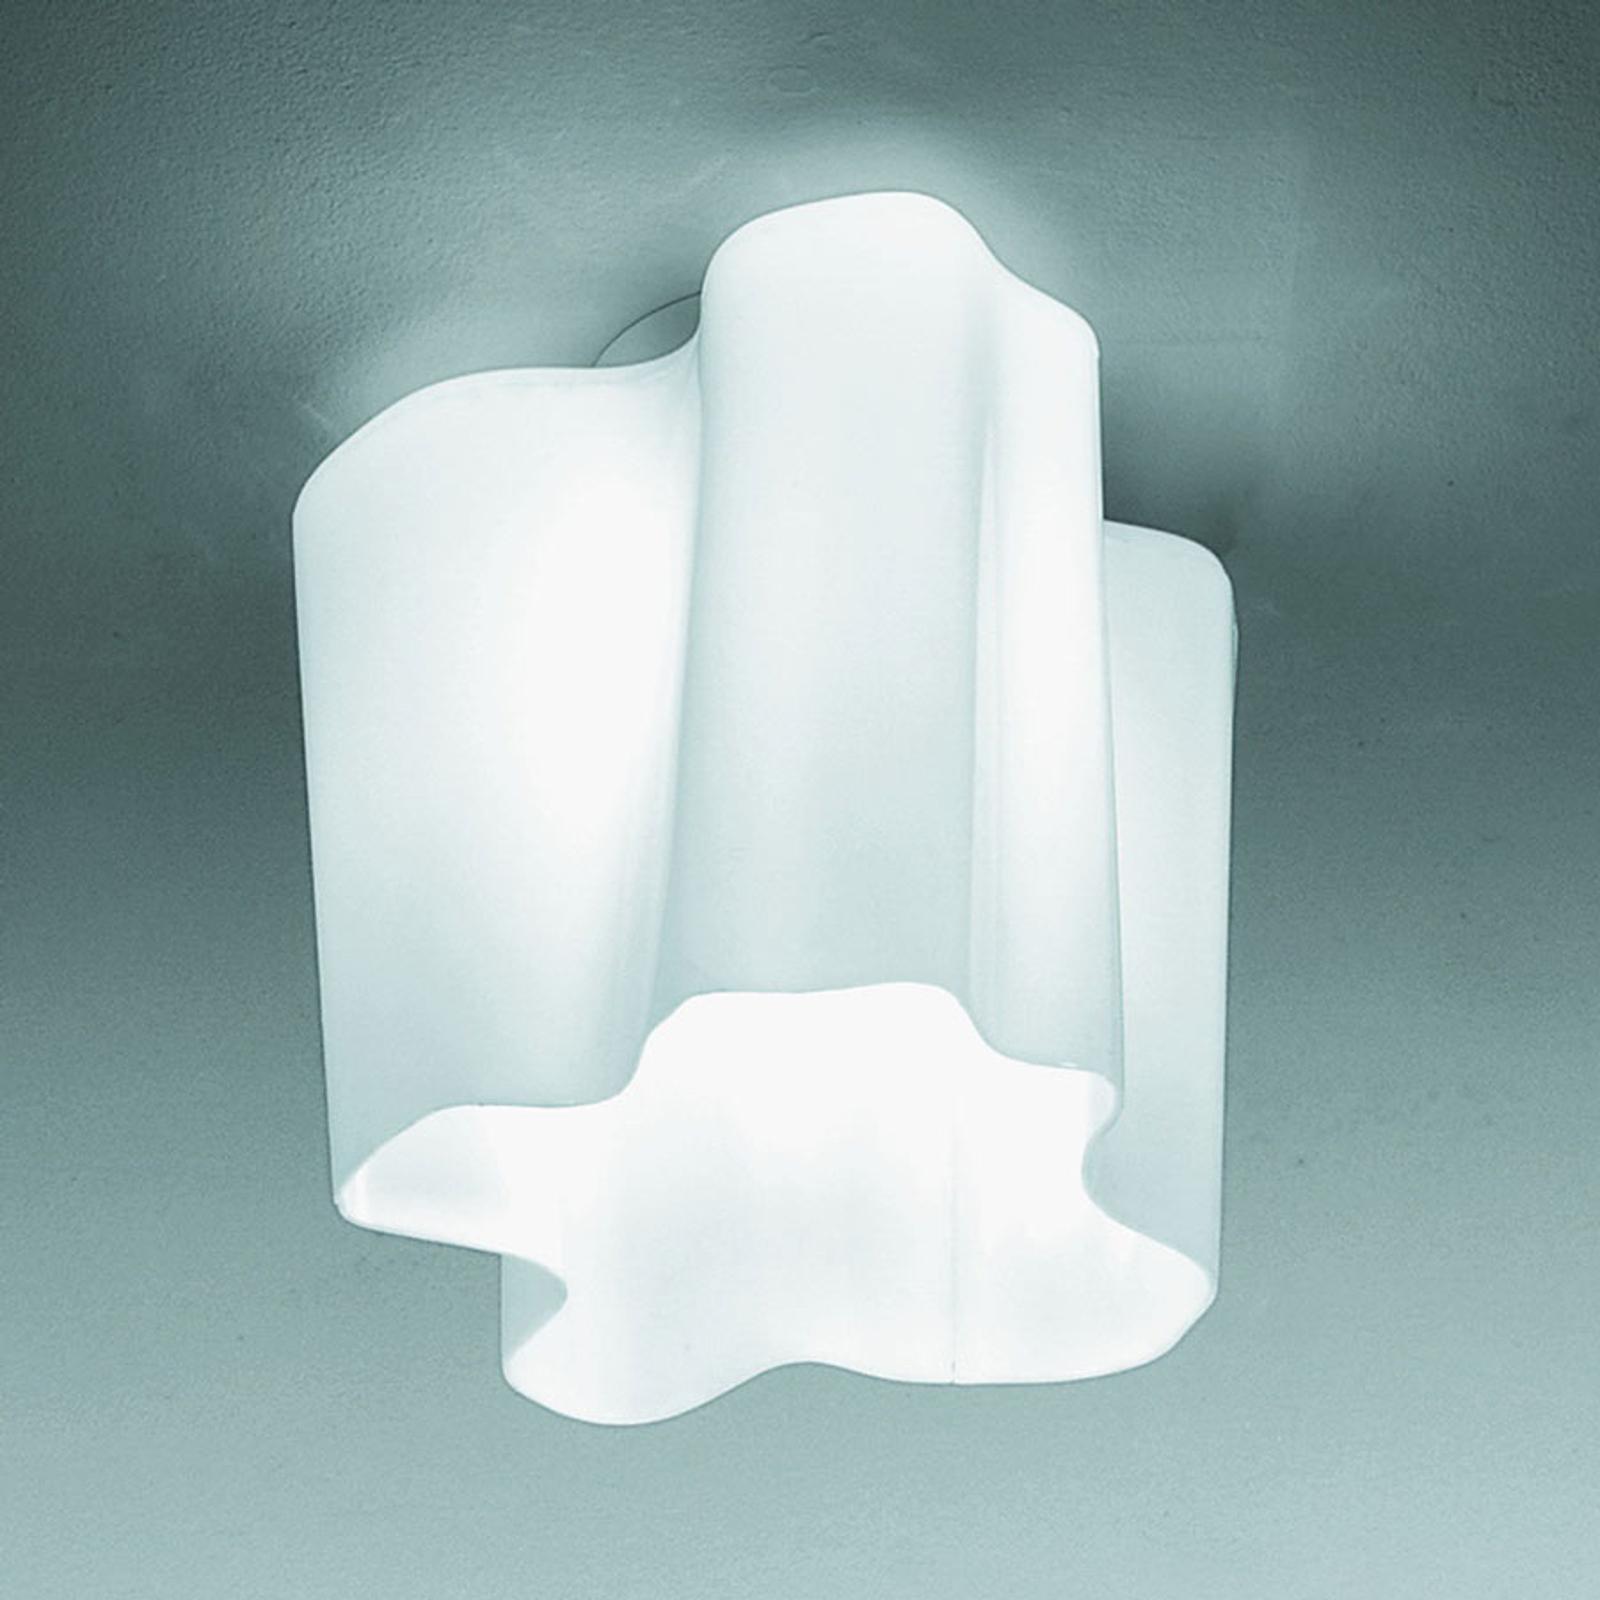 Artemide Logico Micro taklampe 18 x 18 cm